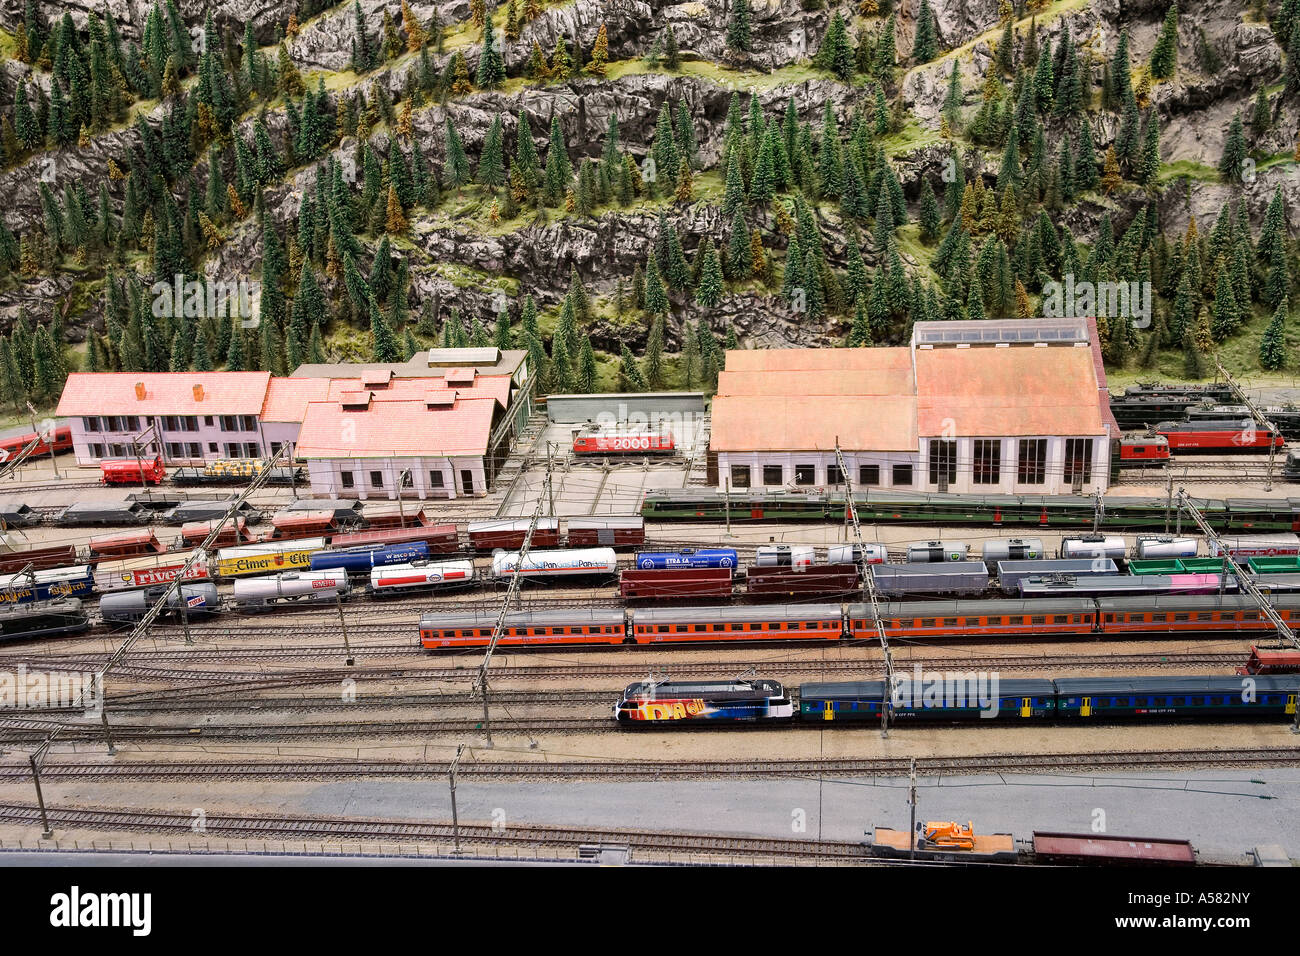 Model of the train station of Erstfeld at the Gotthard railway model, Museum of Transport, Lucerne, Switzerland - Stock Image